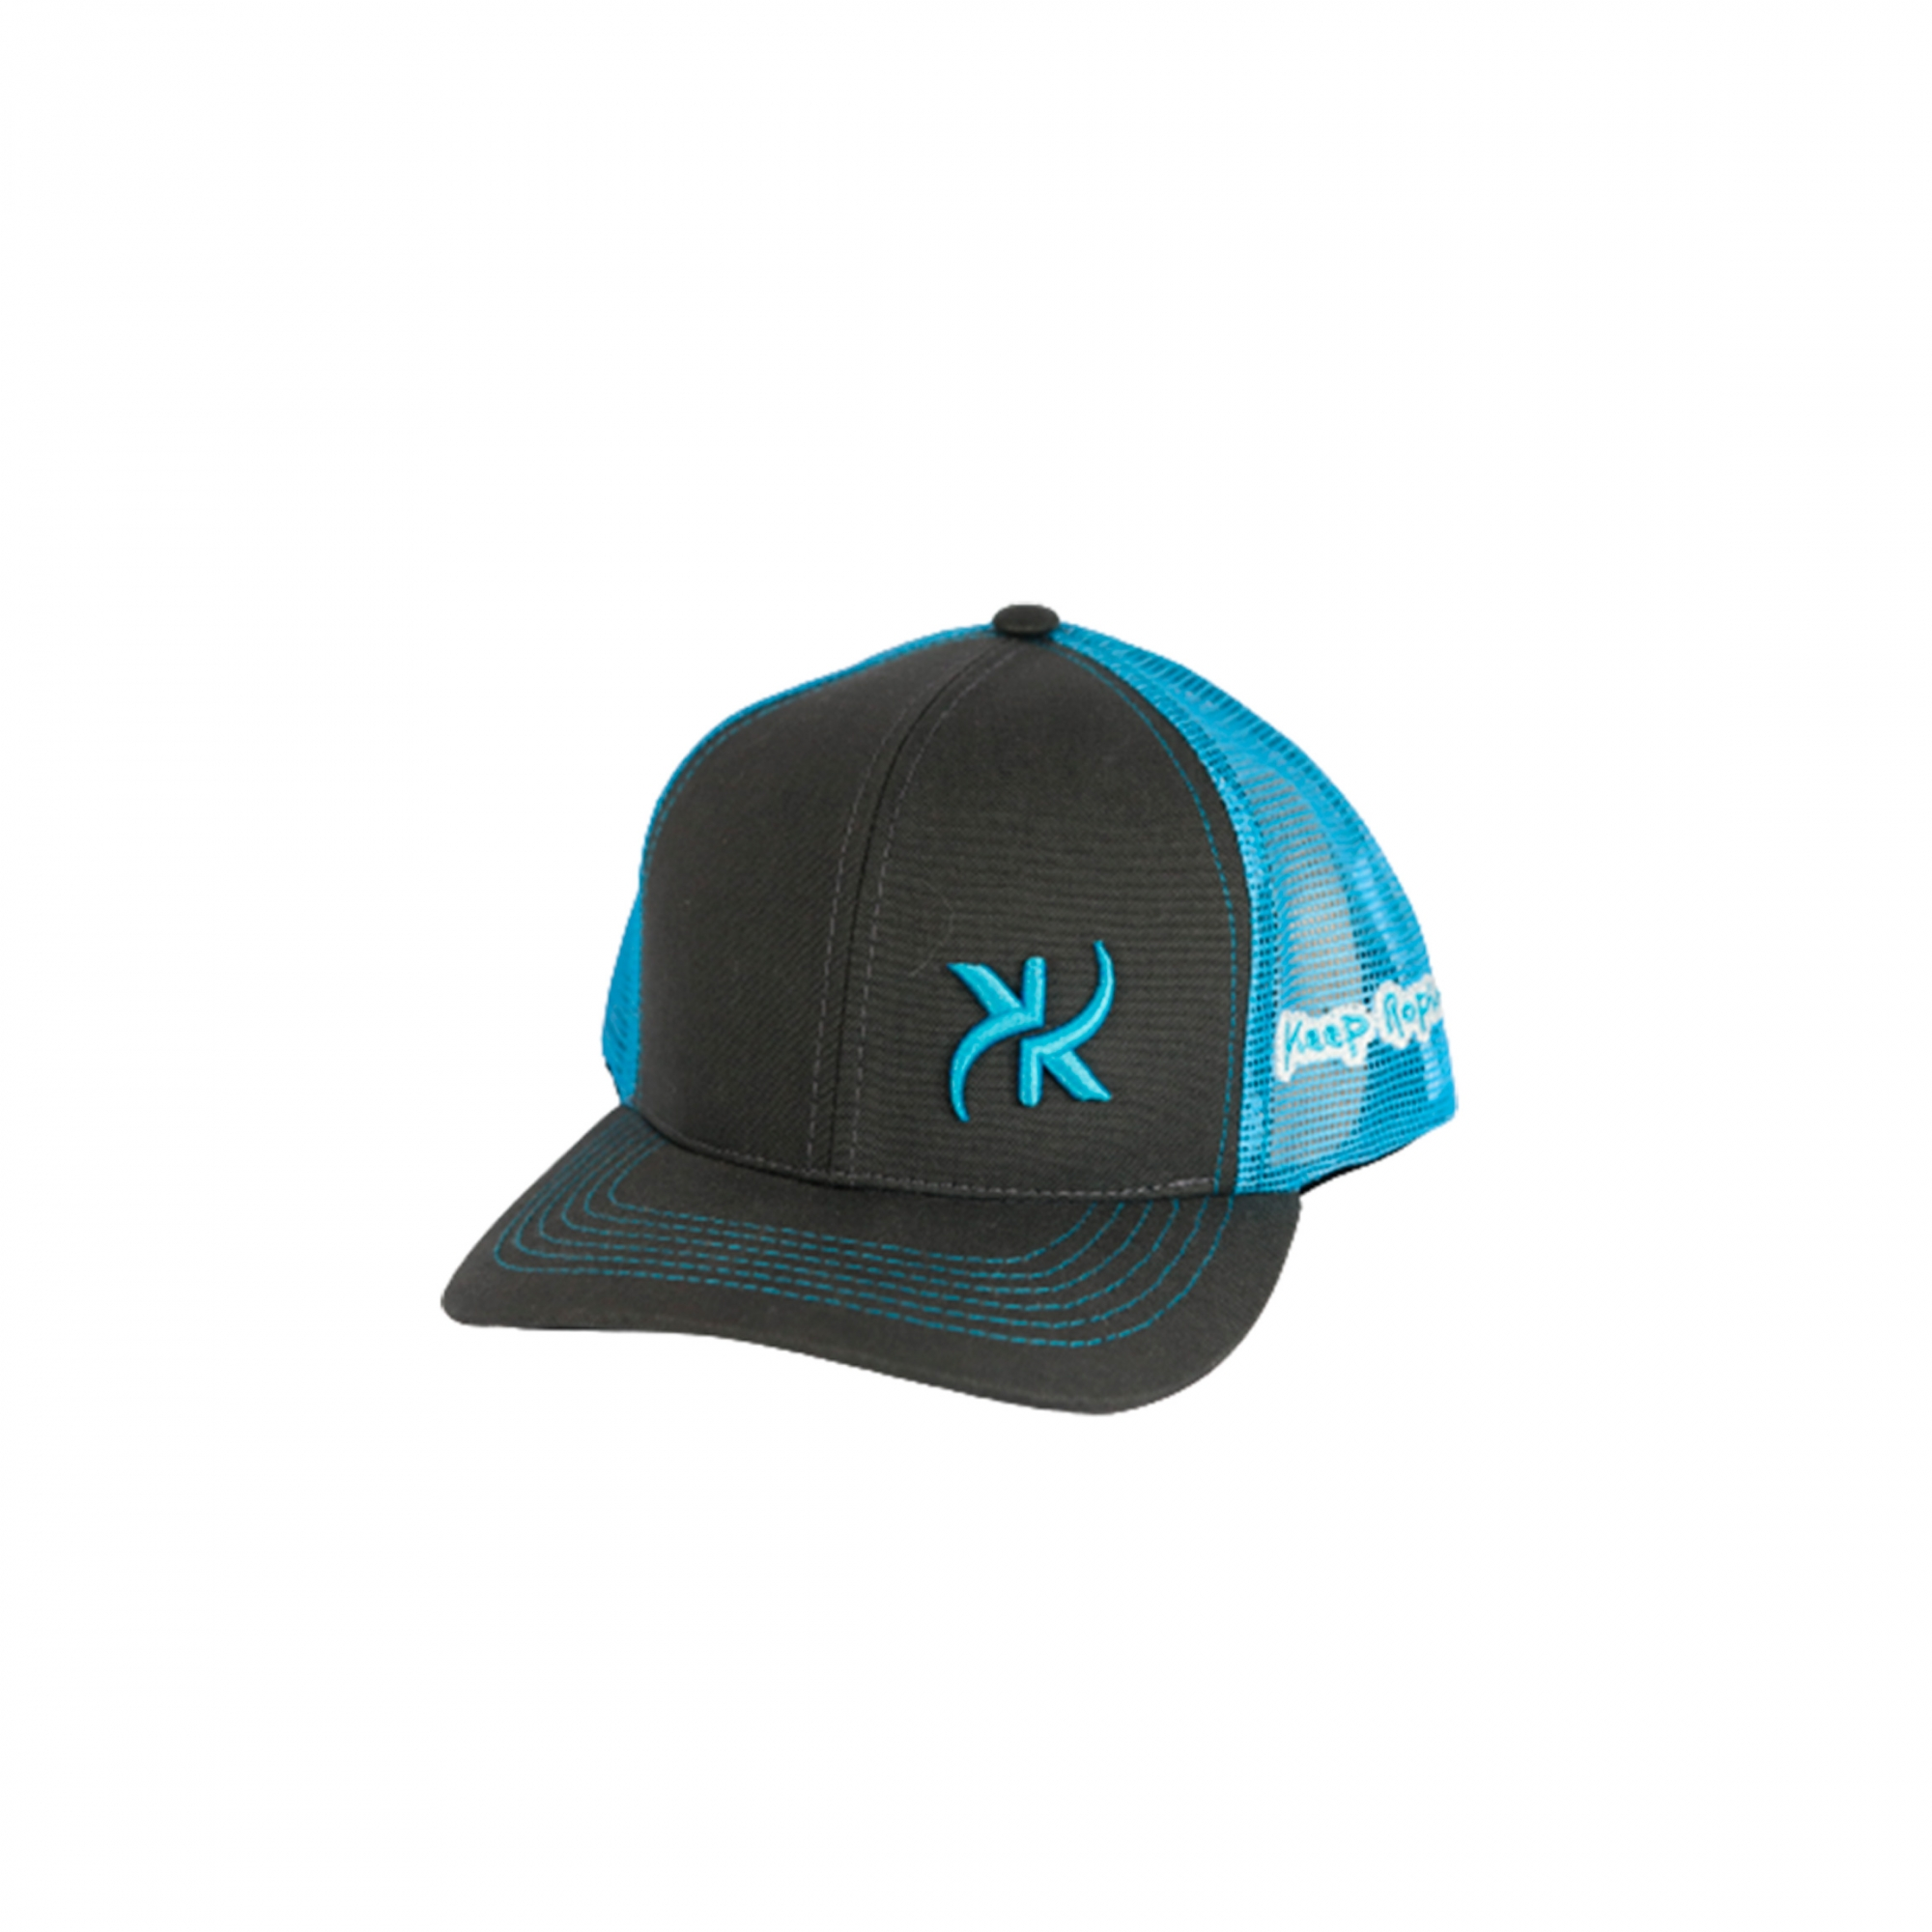 Boné Keep Roping Trucker Hat com aba curva chumbo/Azul